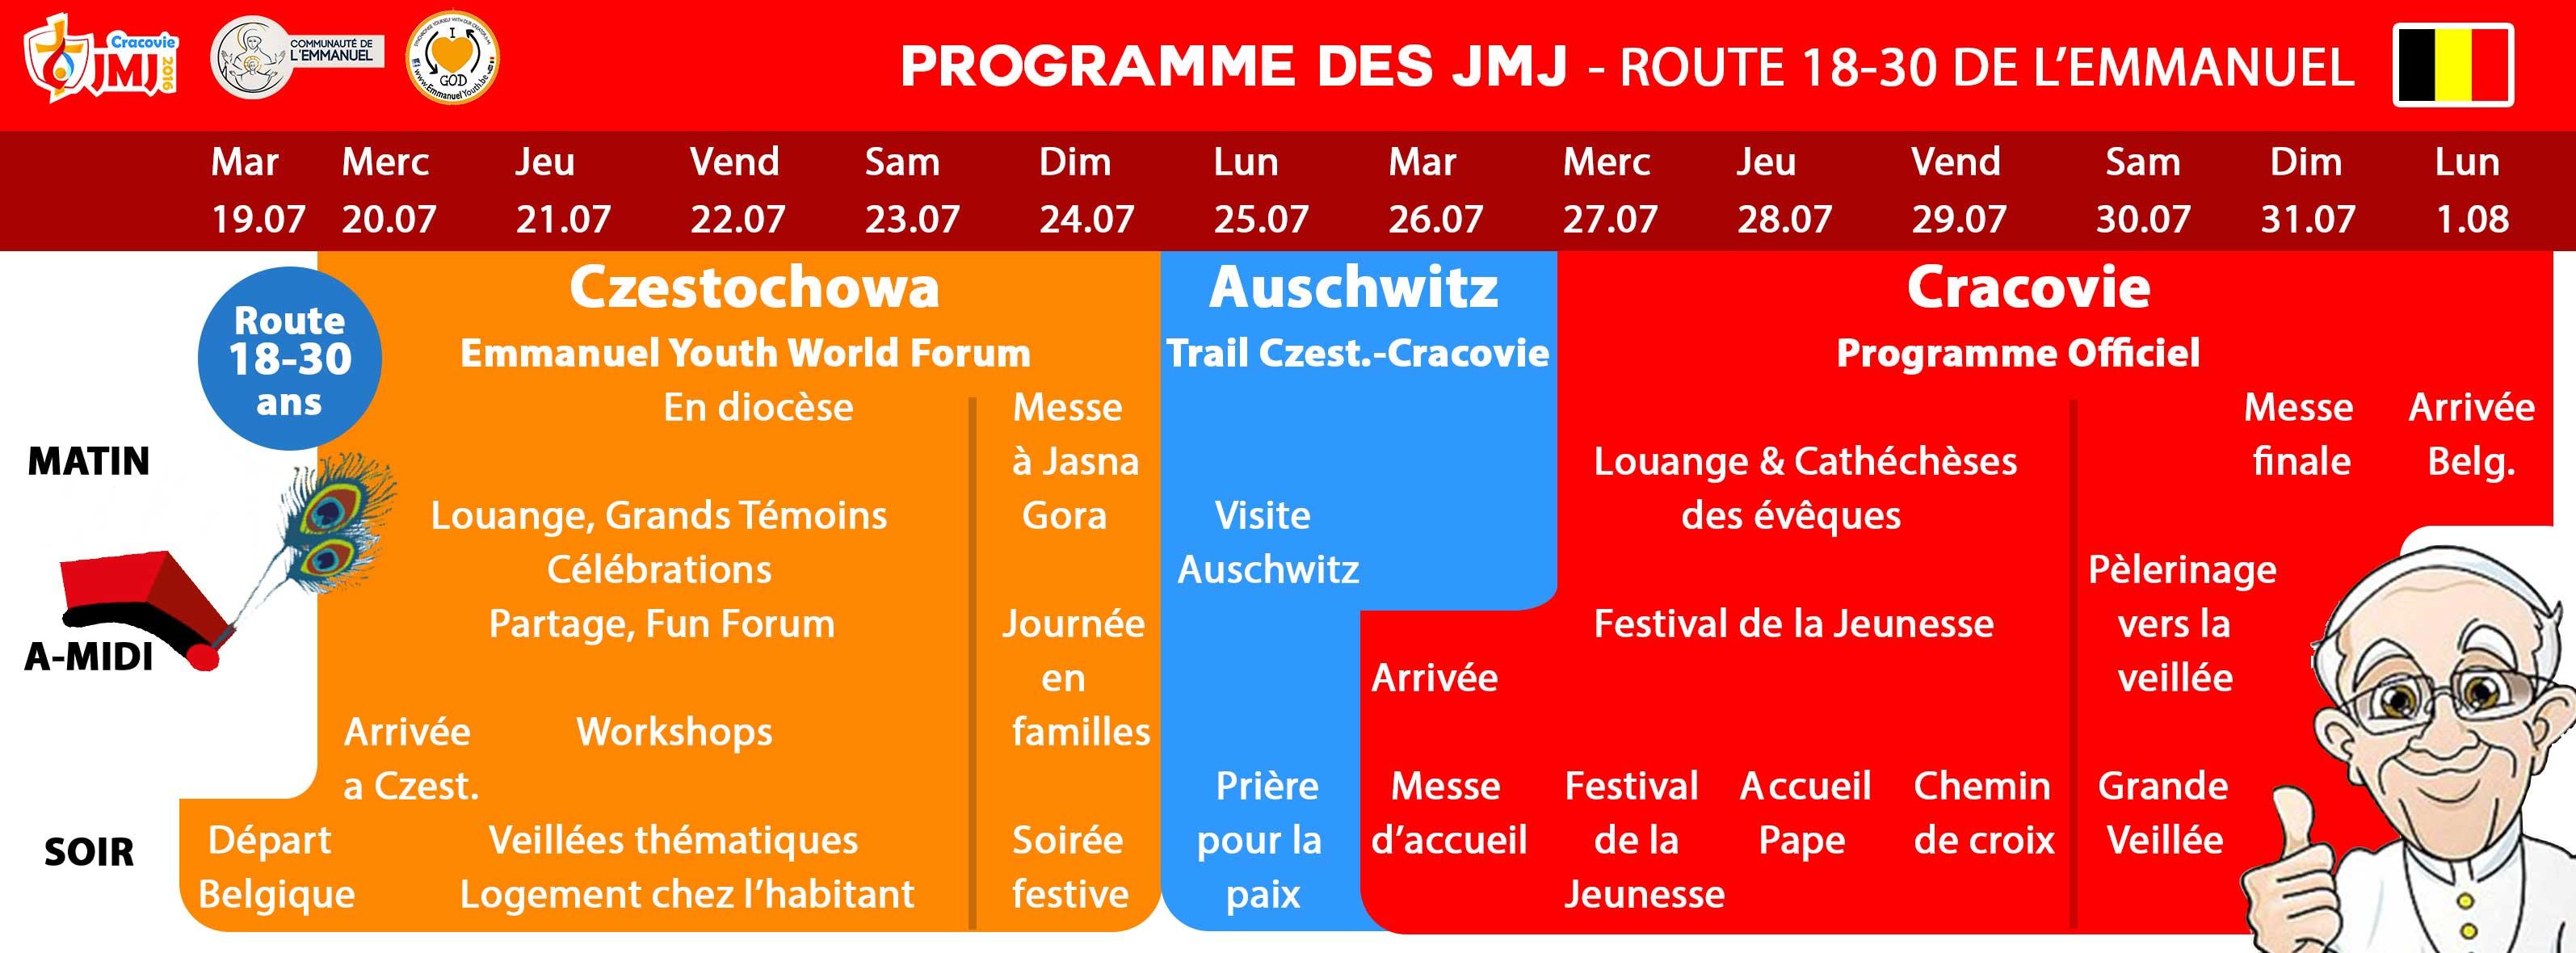 JMJ2016-ProgrammeRouteEmmanuel-18-30v1